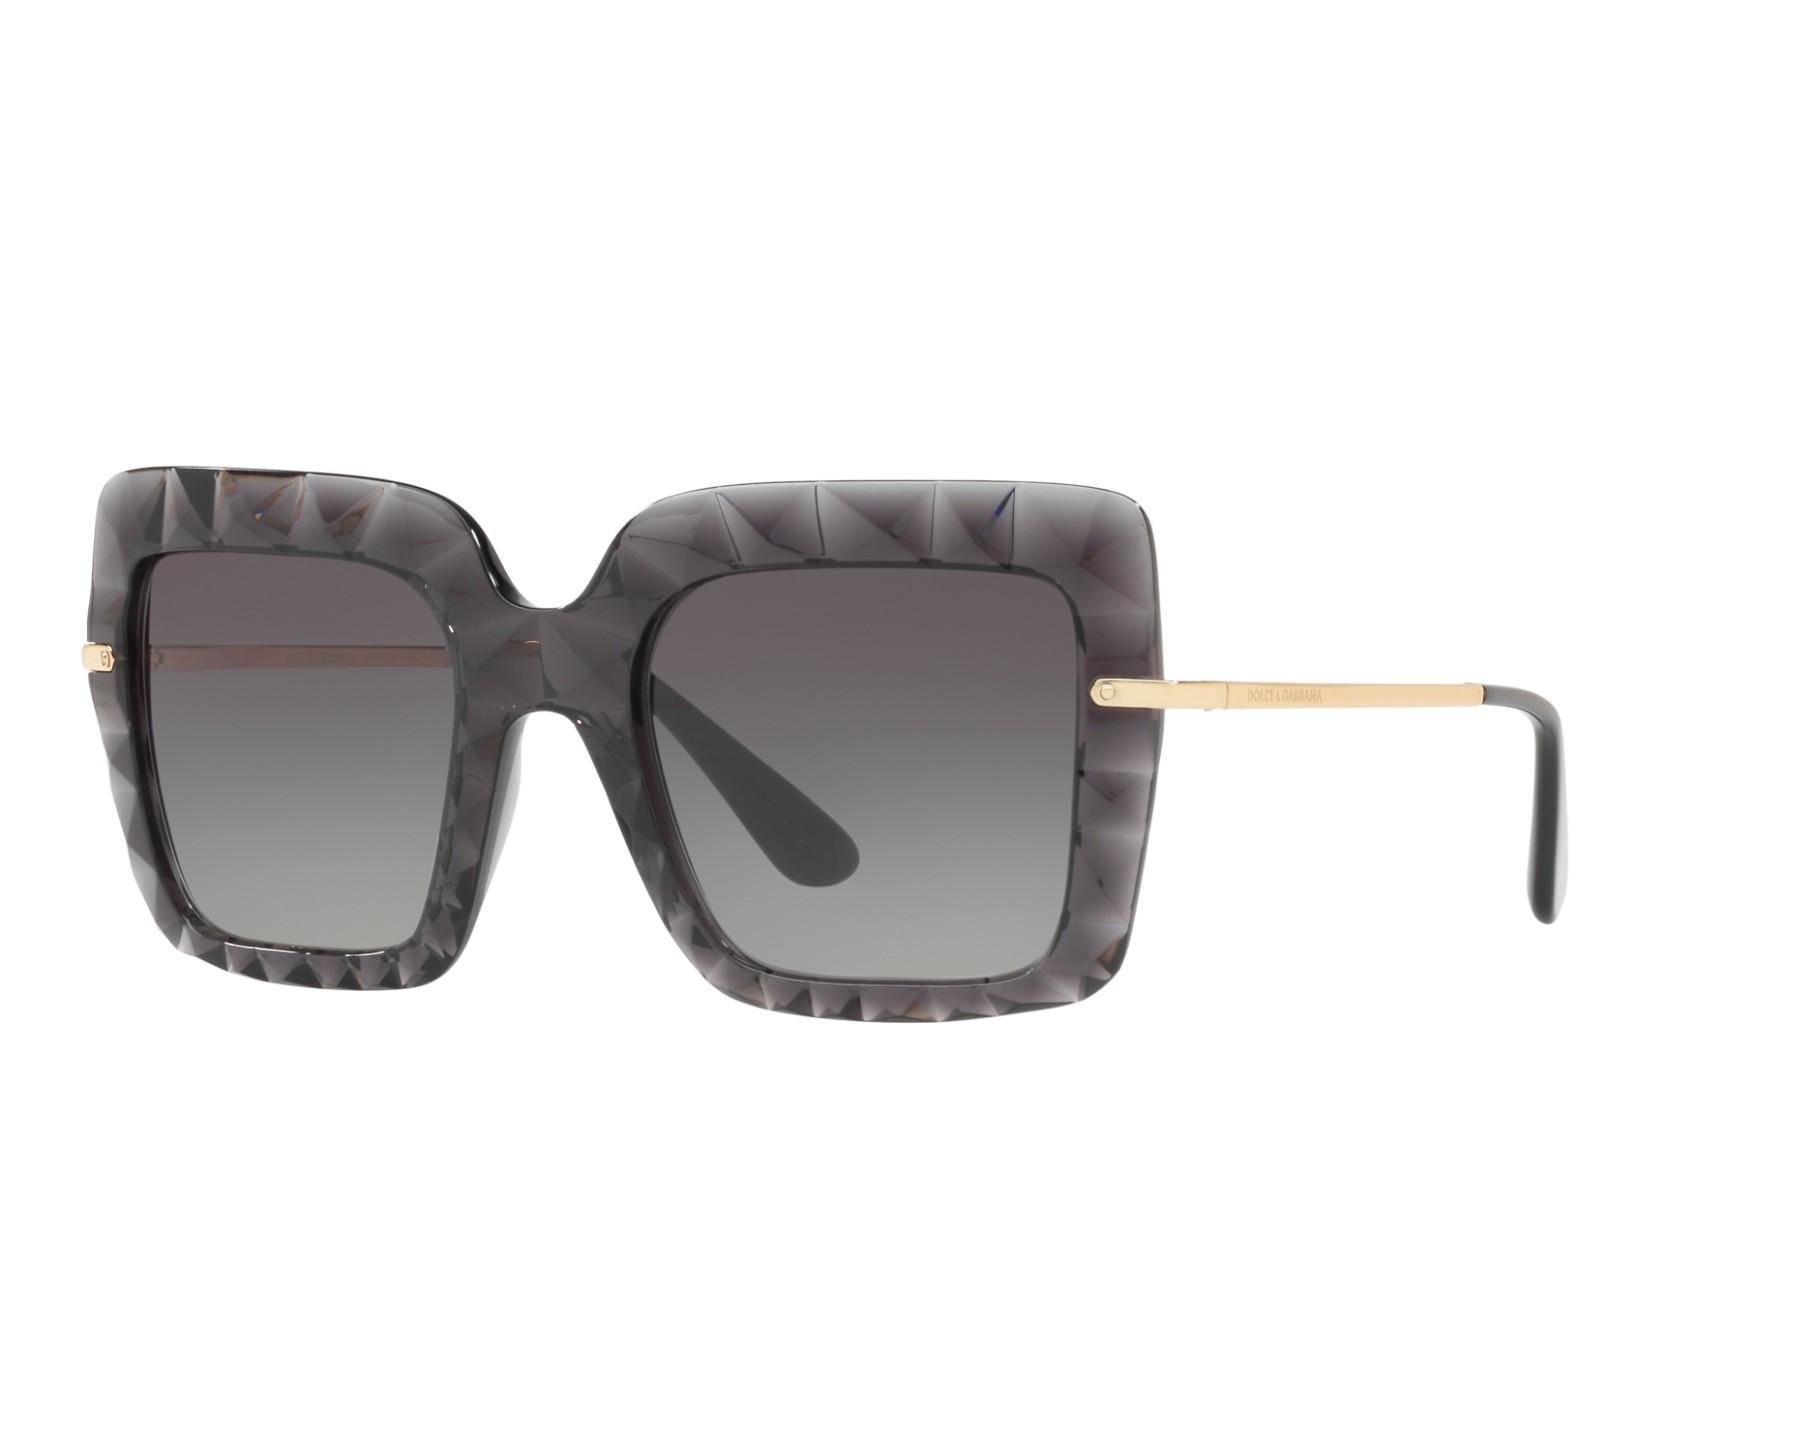 Dolce & Gabbana DG6111 504/8G 51 mm/22 mm sY6zz